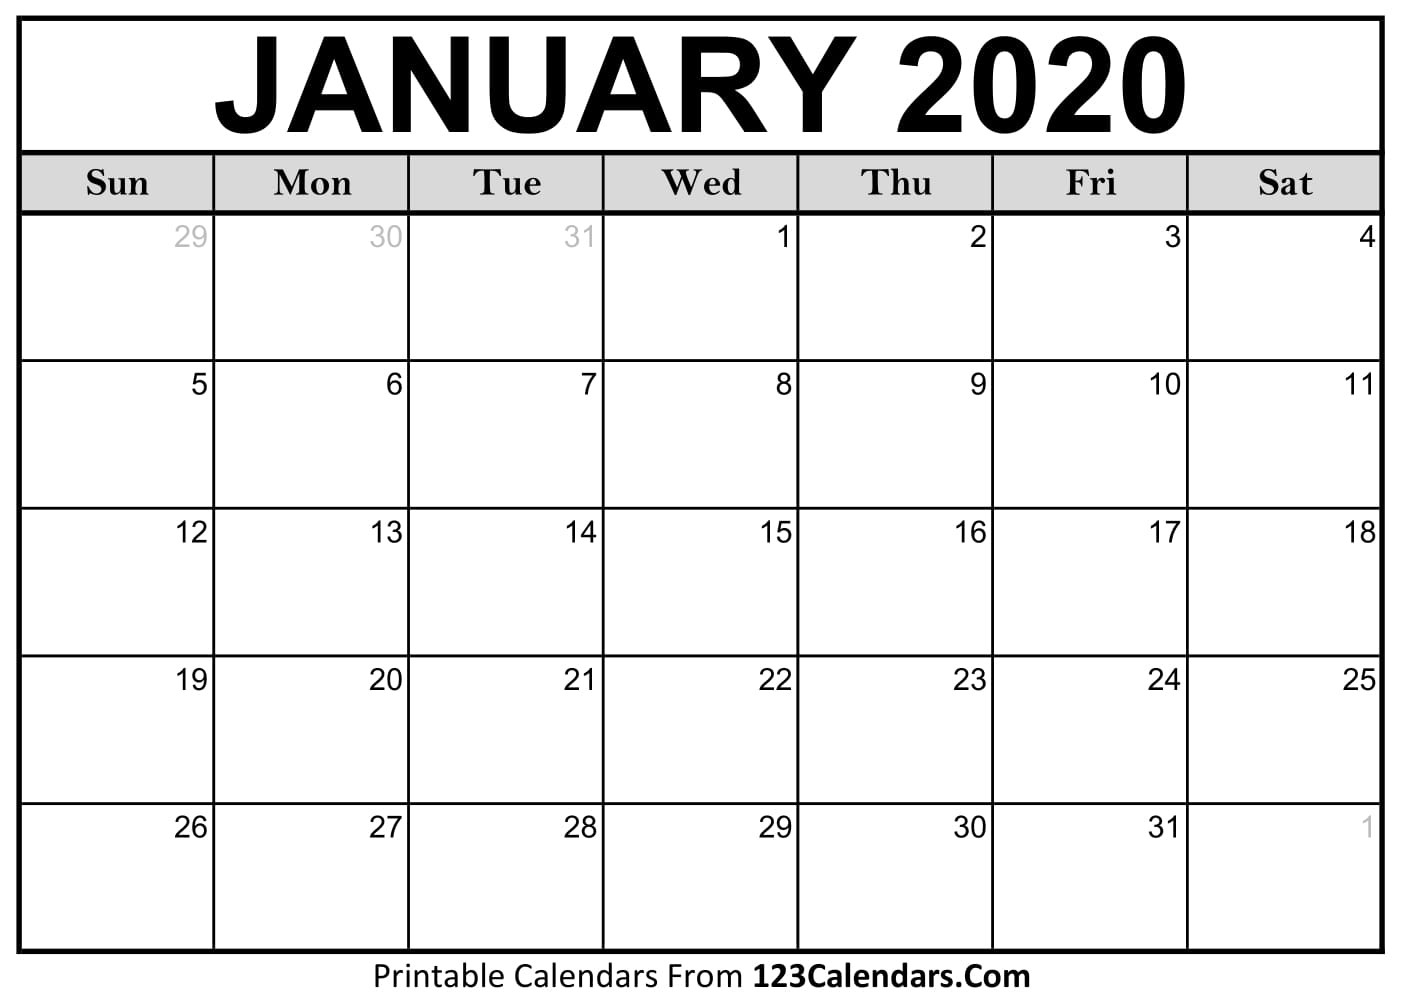 Free Printable Calendar | 123Calendars-Blank 2020 Calendar Month By Month